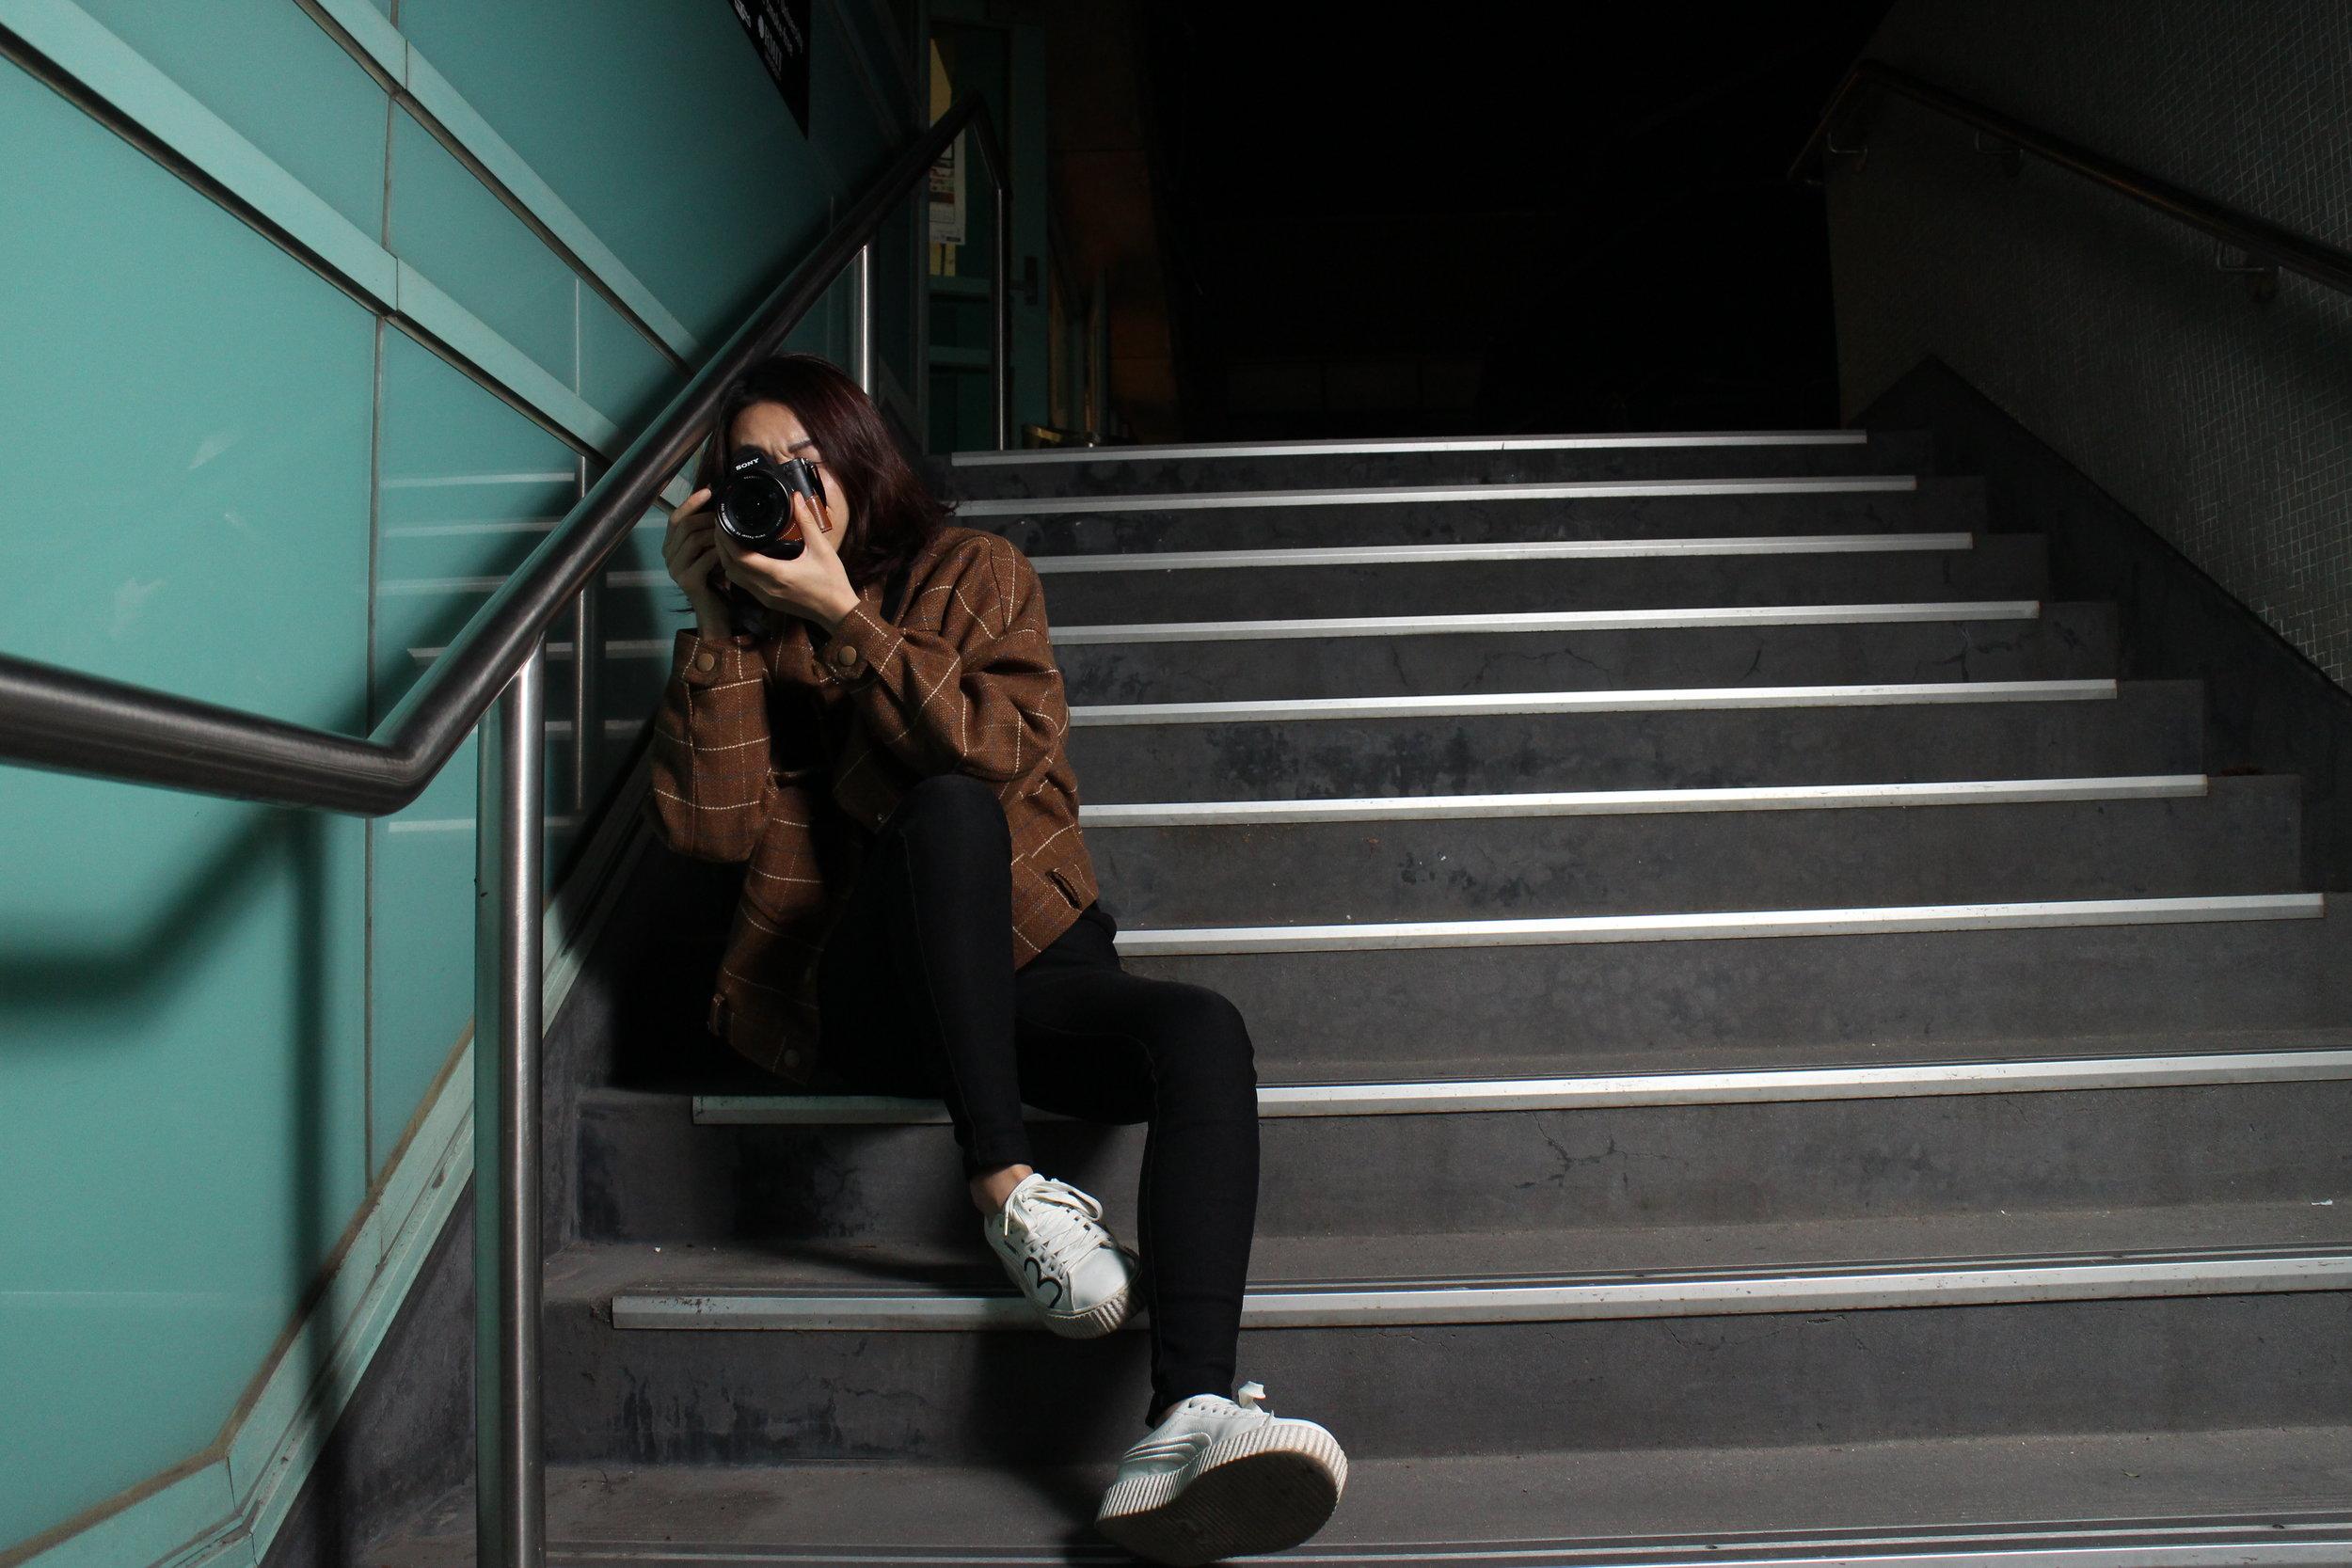 Photographer: YAN XU